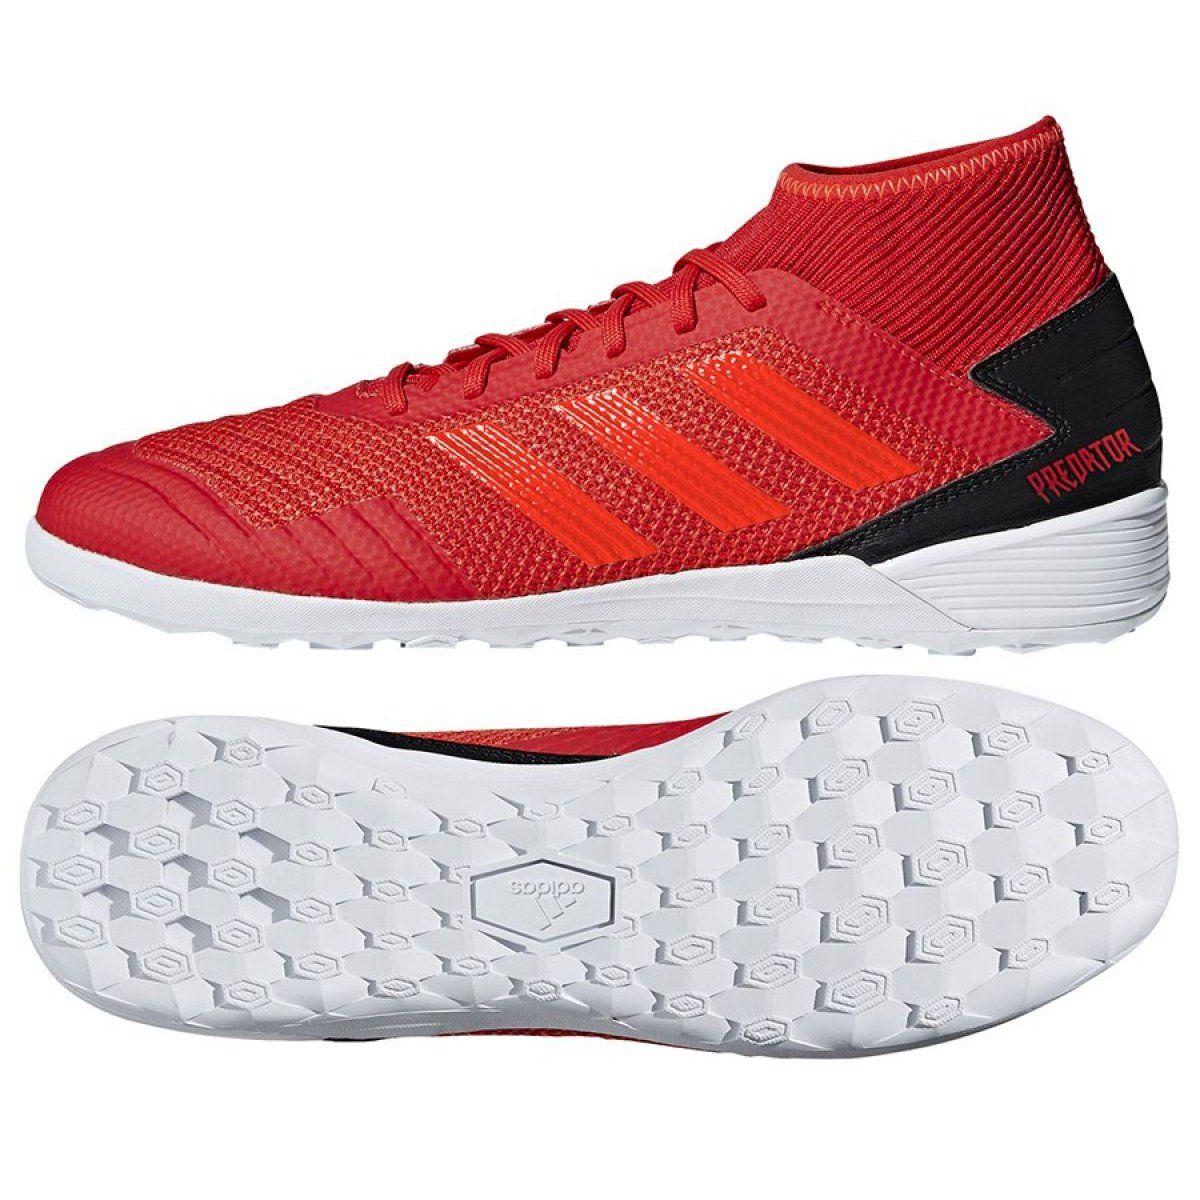 Indoor Shoes Adidas Predator 19 3 In M D97965 Mens Soccer Cleats Adidas Predator Soccer Shoes